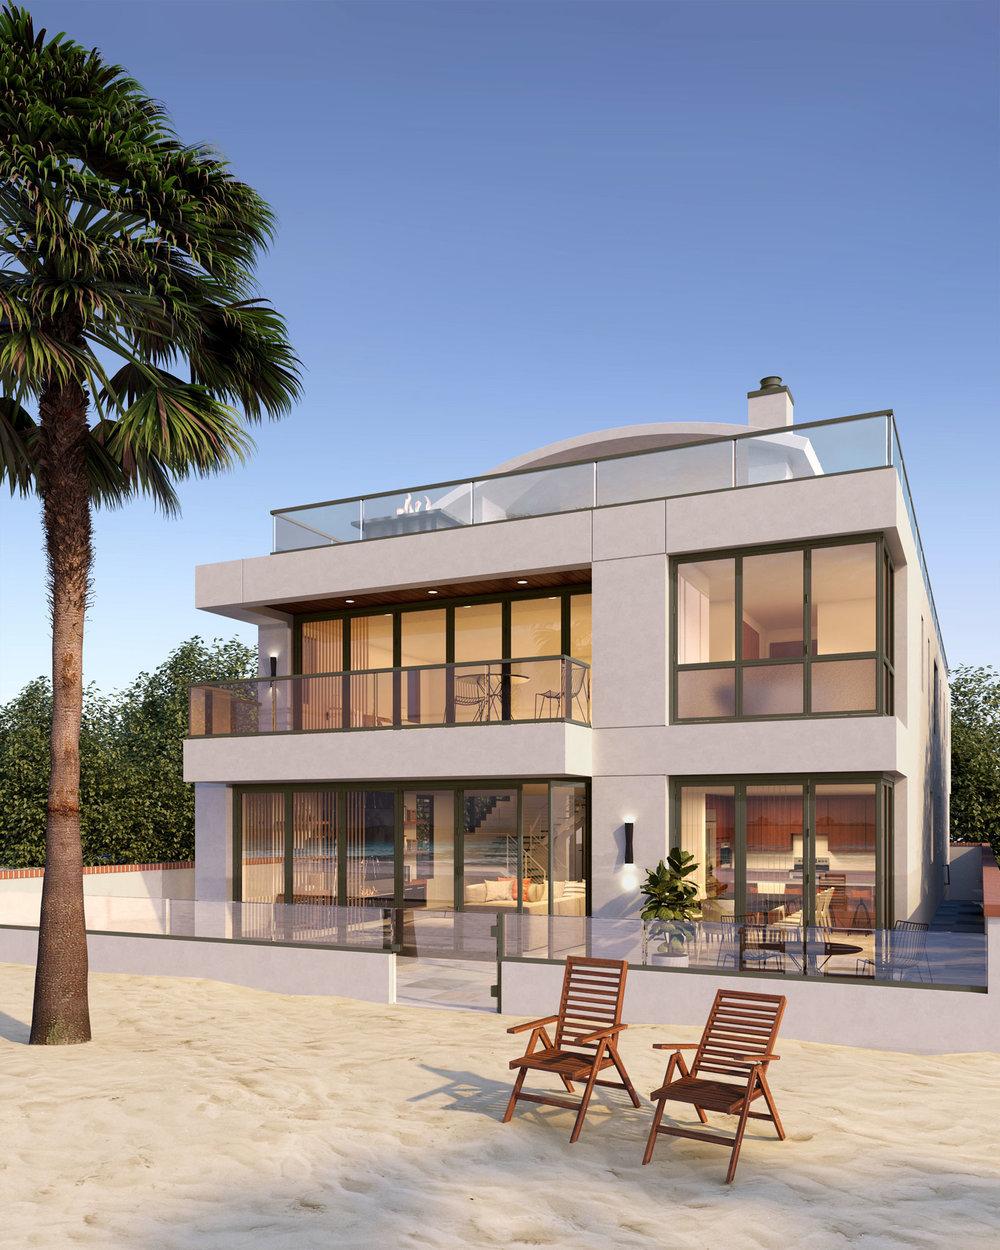 Newport Beach - Contemporary Beach House Exterior Rear by Oatman Architects